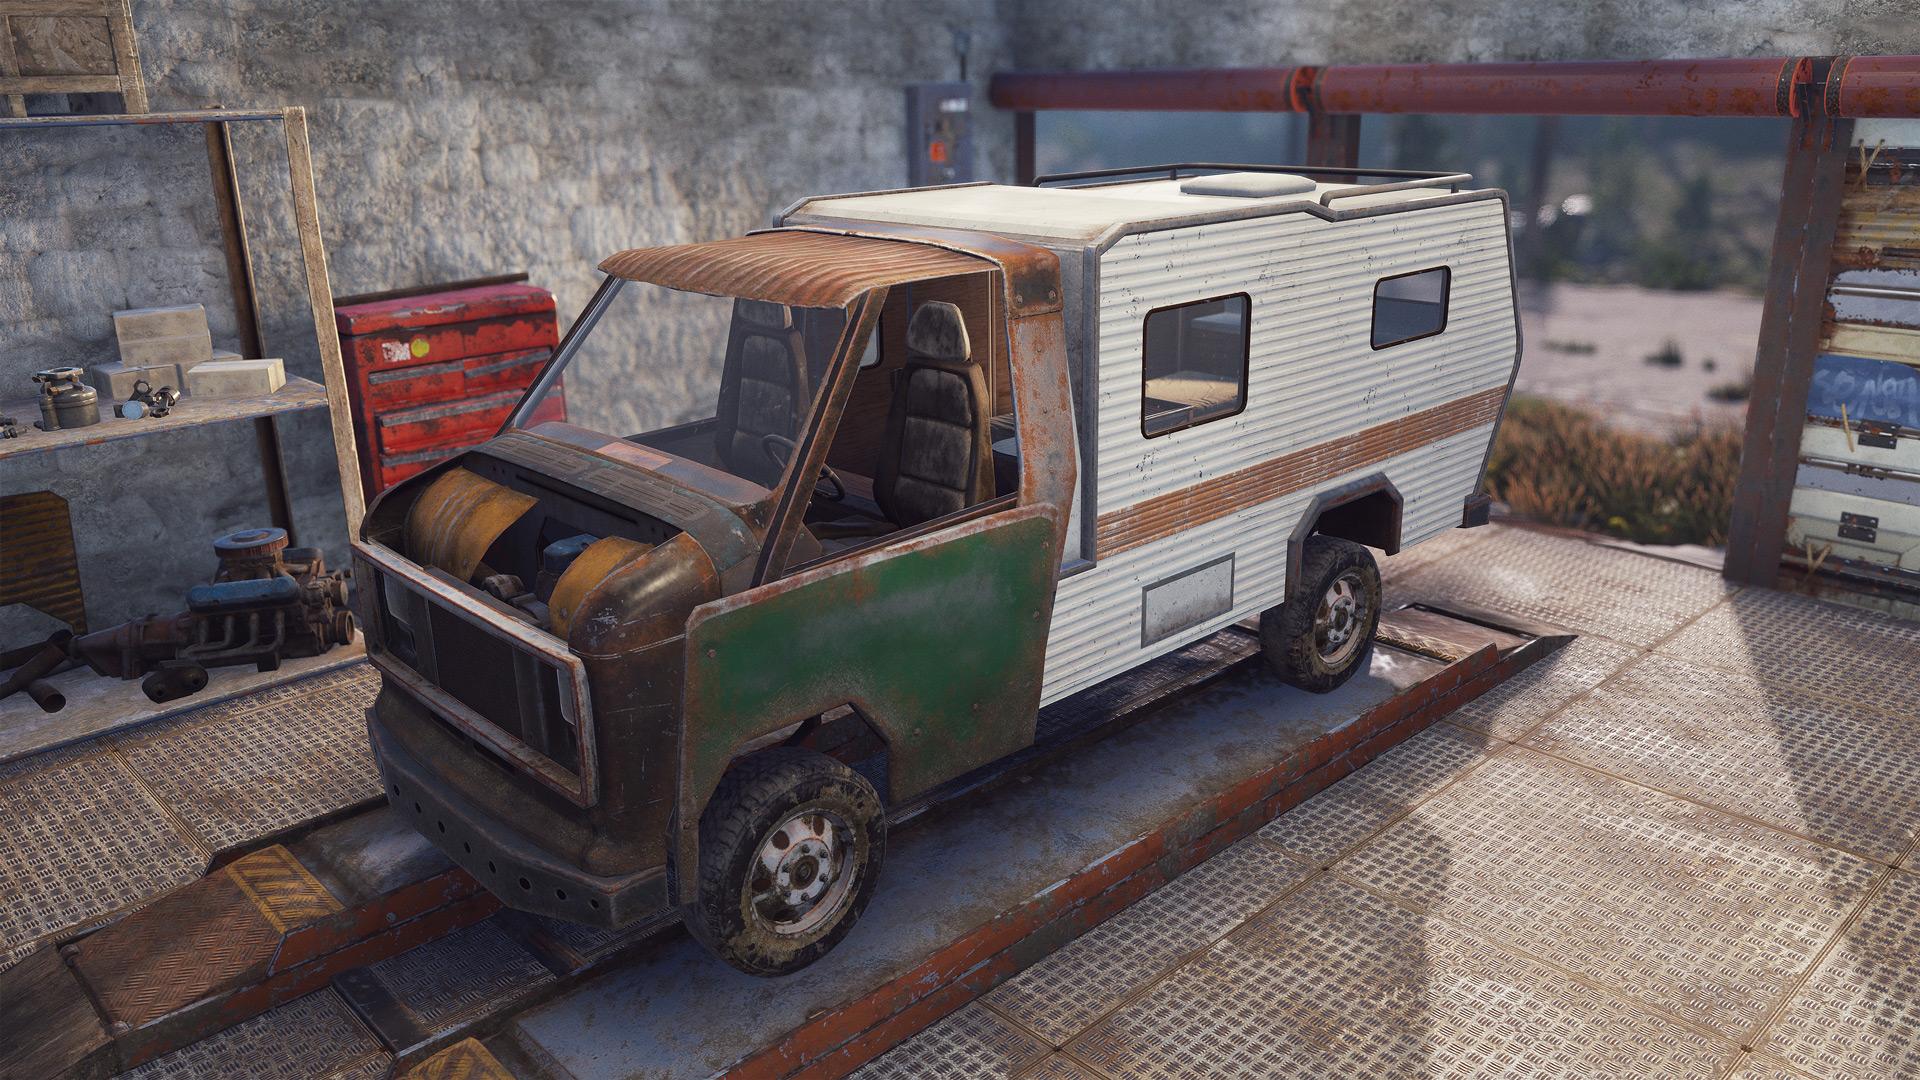 campervan_garage_02.jpg